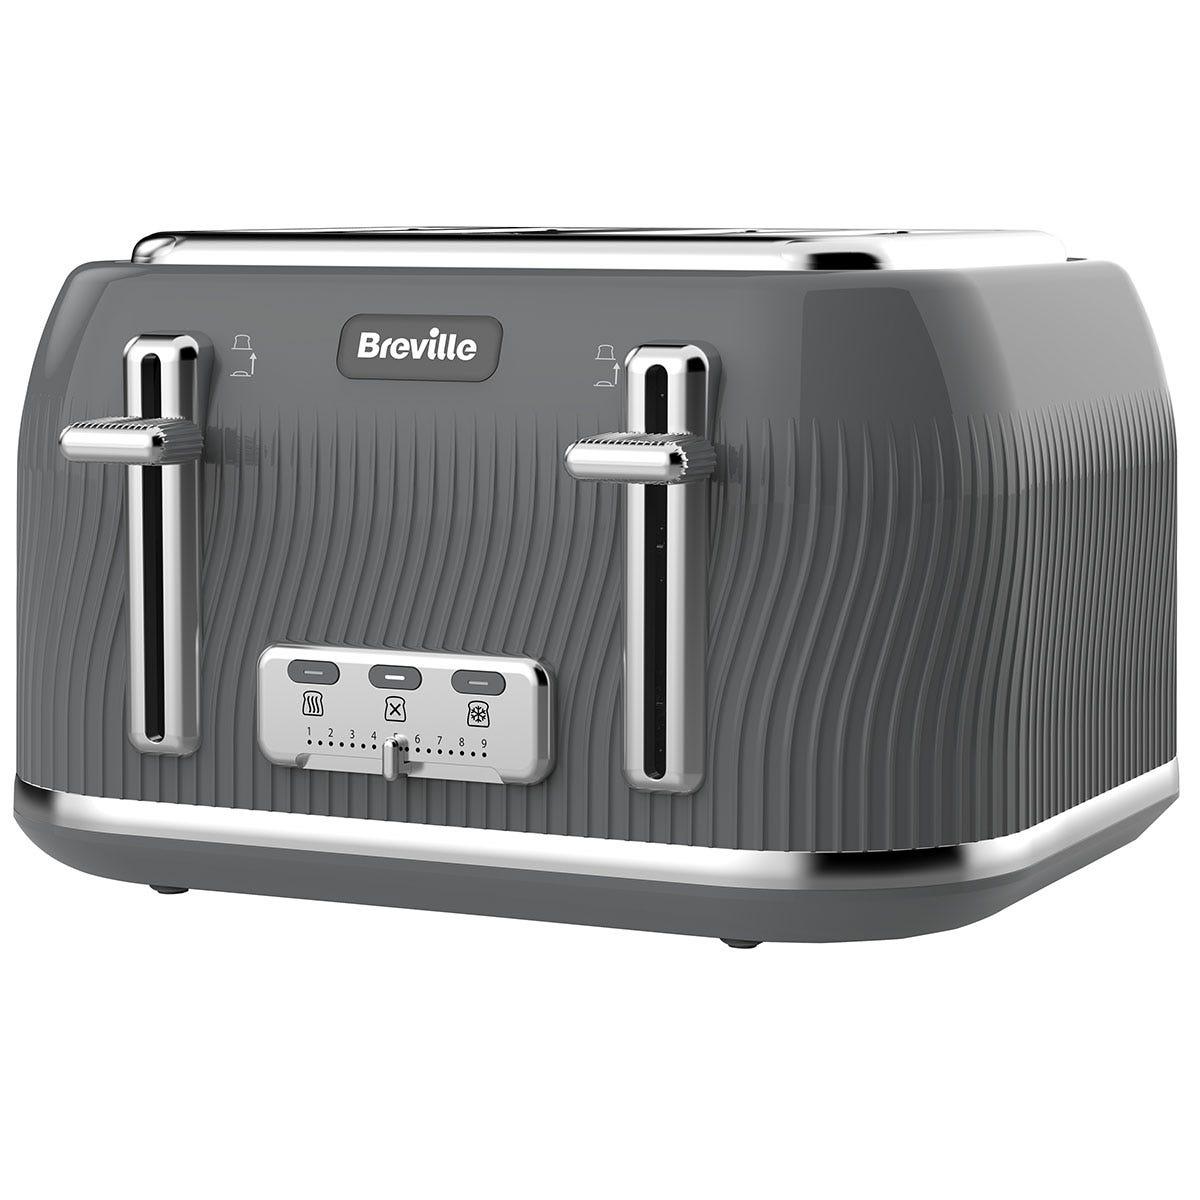 Breville VTT892 Flow Collection 4-Slice Toaster - Grey